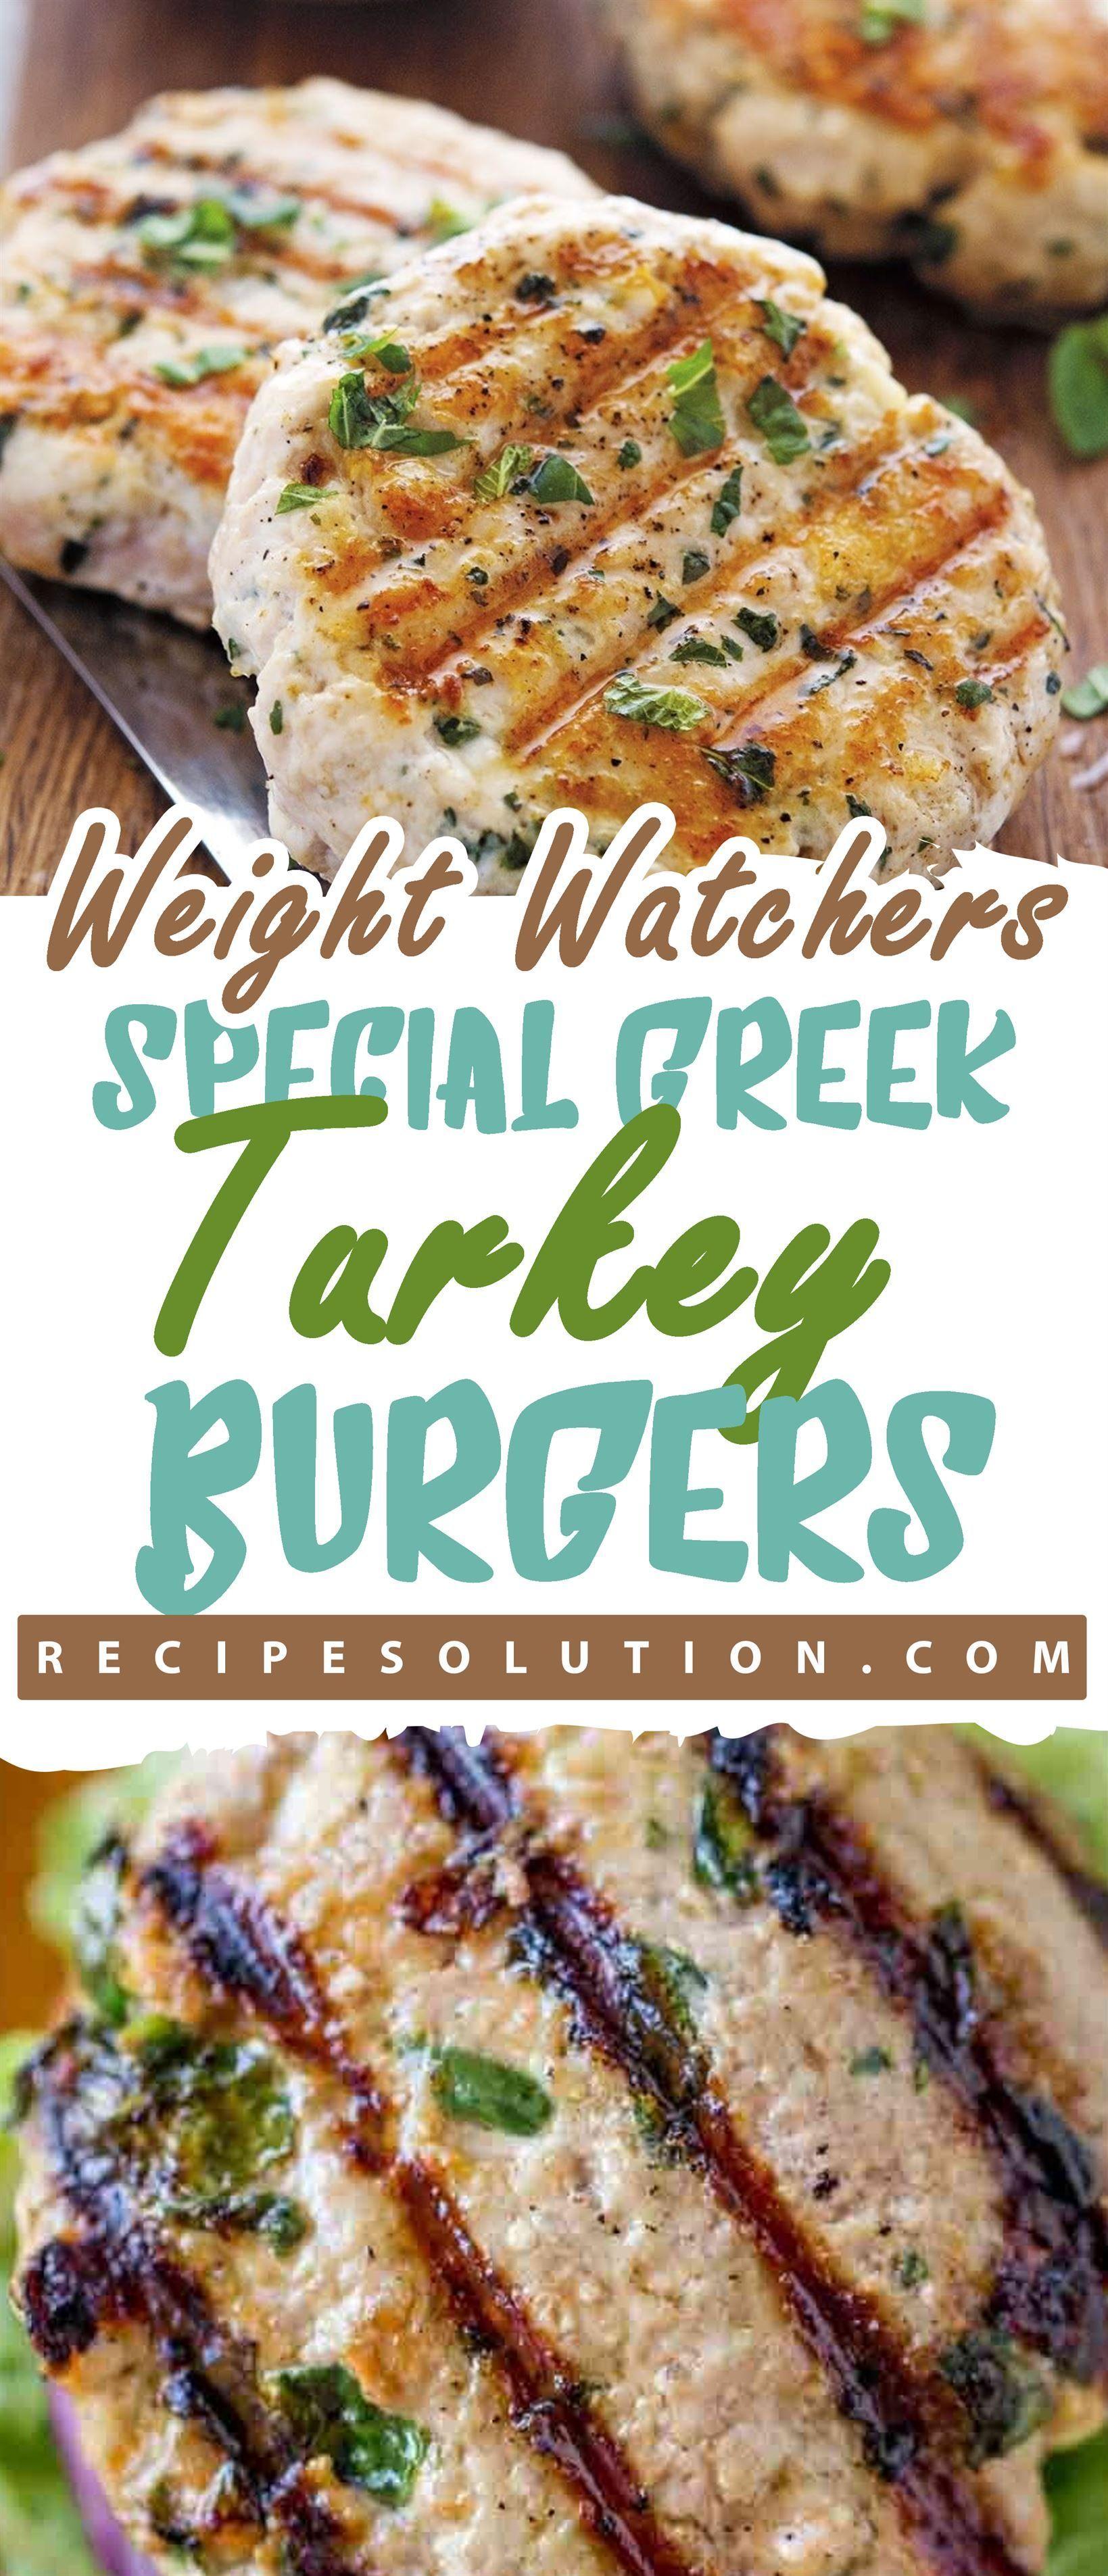 Ww 4 Smartpoints Special Greek Turkey Burgers Turkey Burger Recipes Greek Turkey Burgers Turkey Burgers Healthy